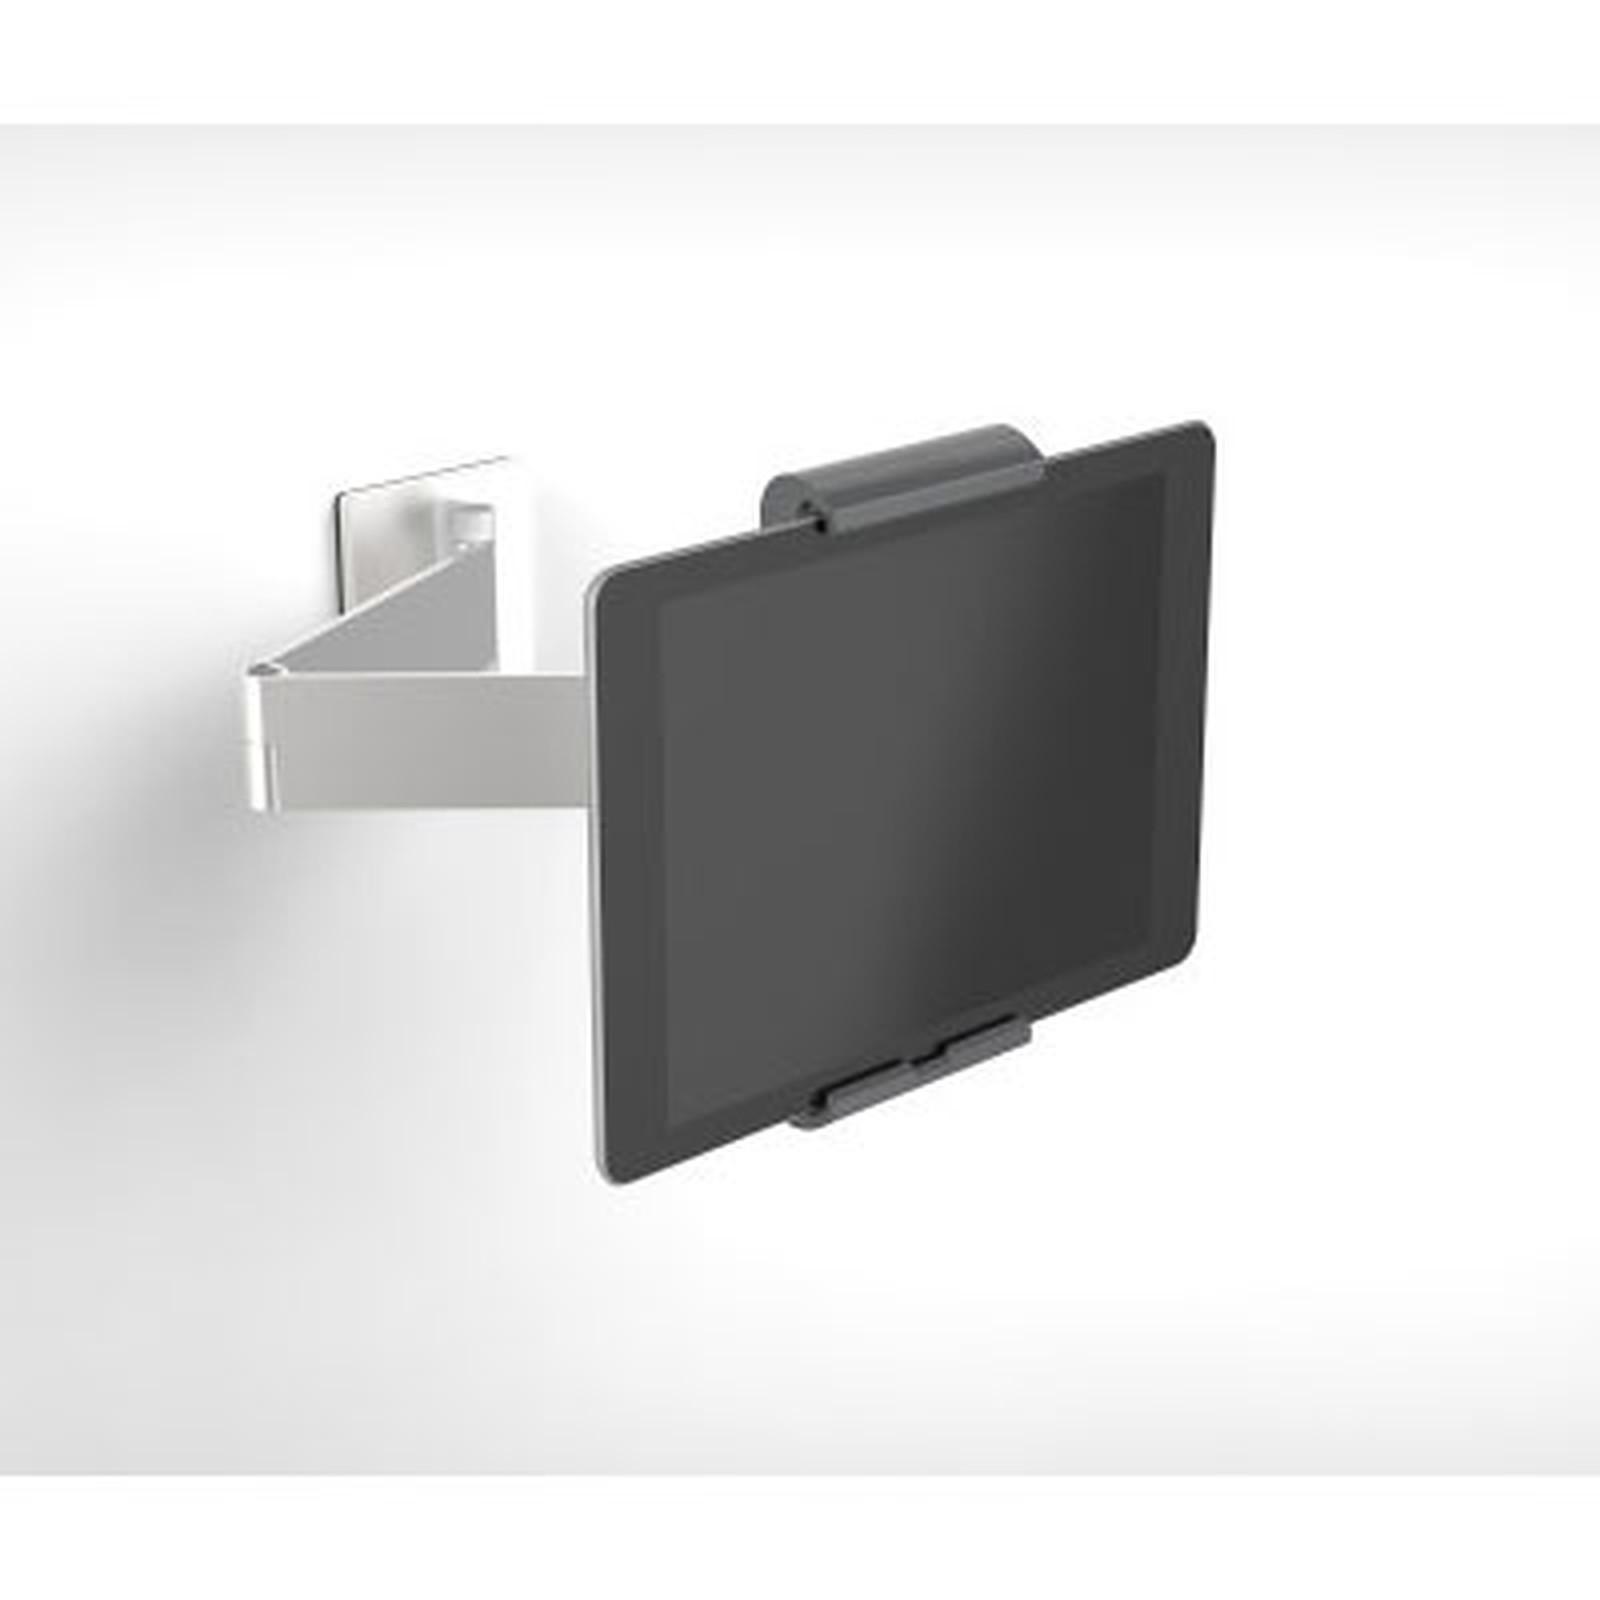 durable support tablette mural avec bras articule 8934 23